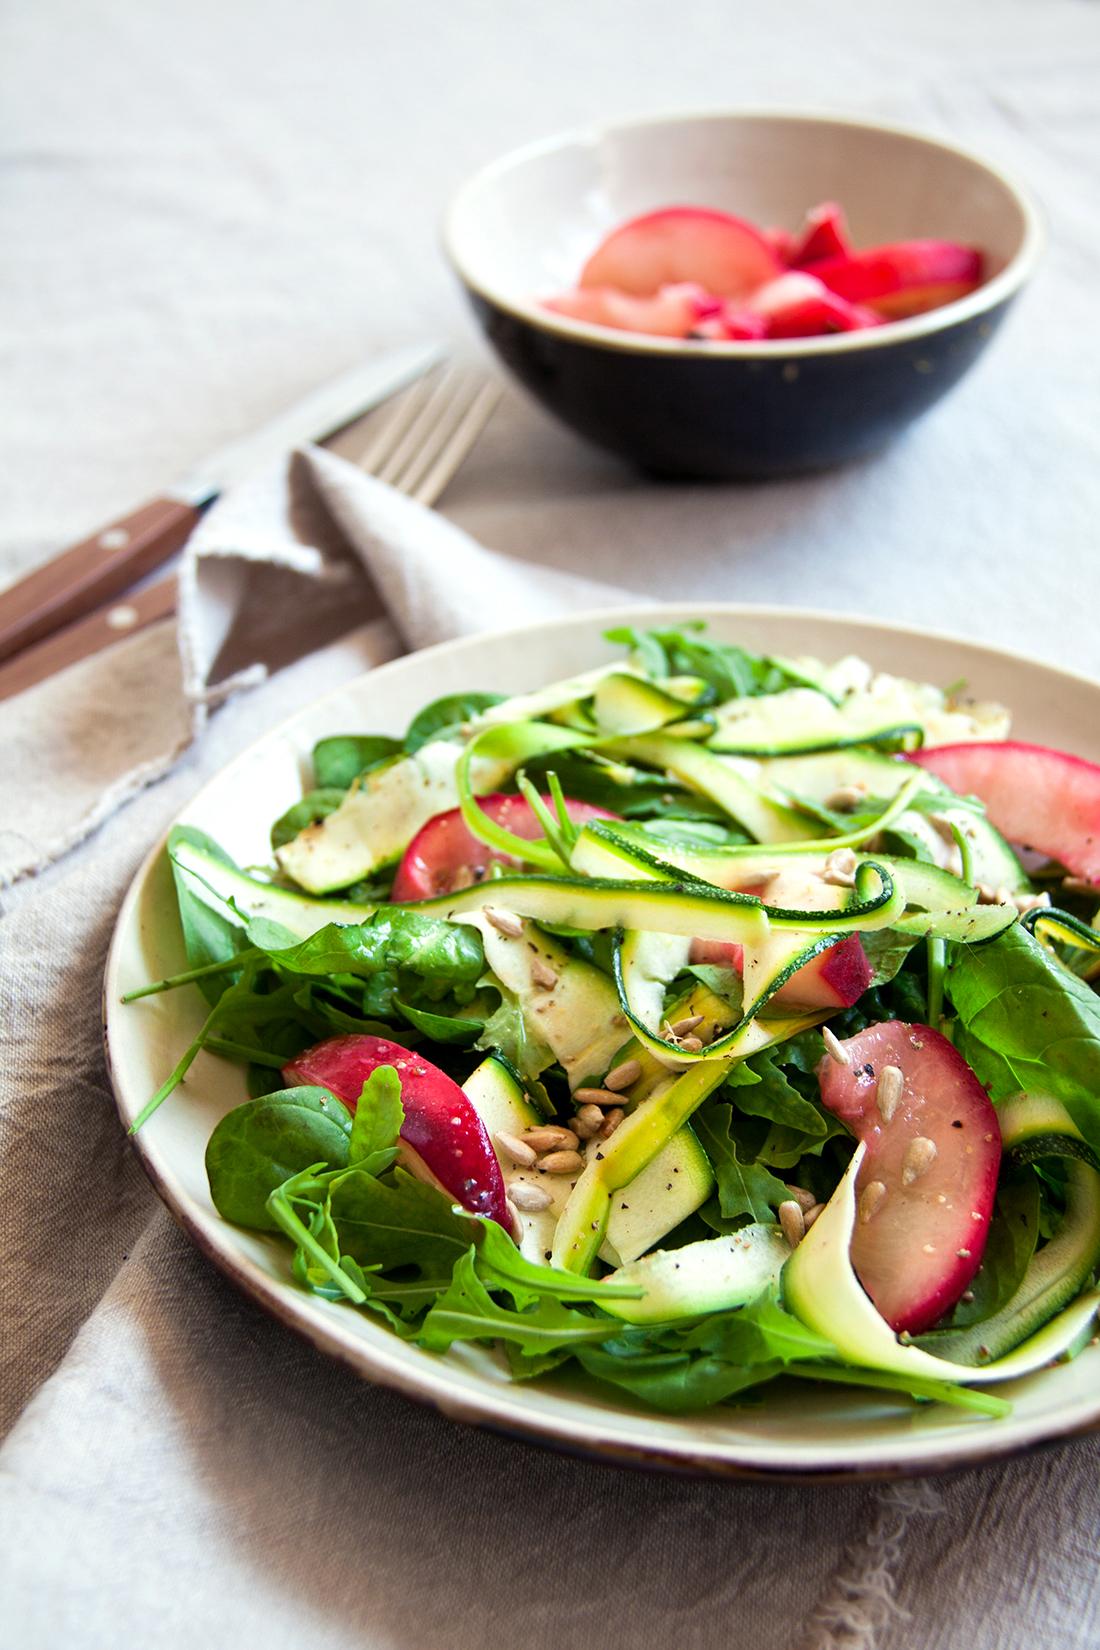 salade-gegrilde-perzik-courgettelinten-vegan-whole-foods-olievrij-glutenvrij-.jpg